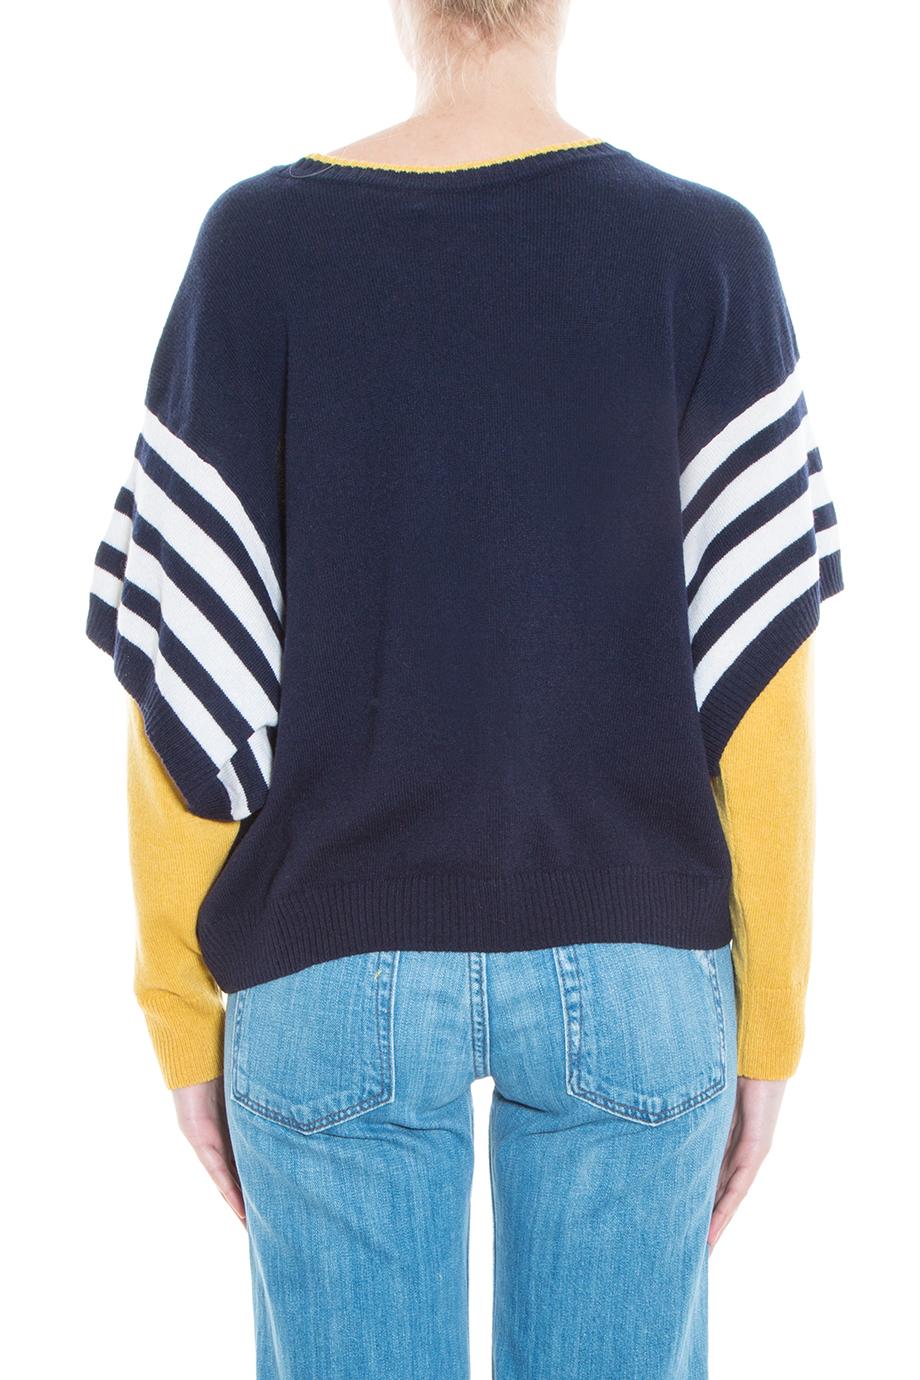 Preen by thornton bregazzi Striped Sweater in Yellow | Lyst